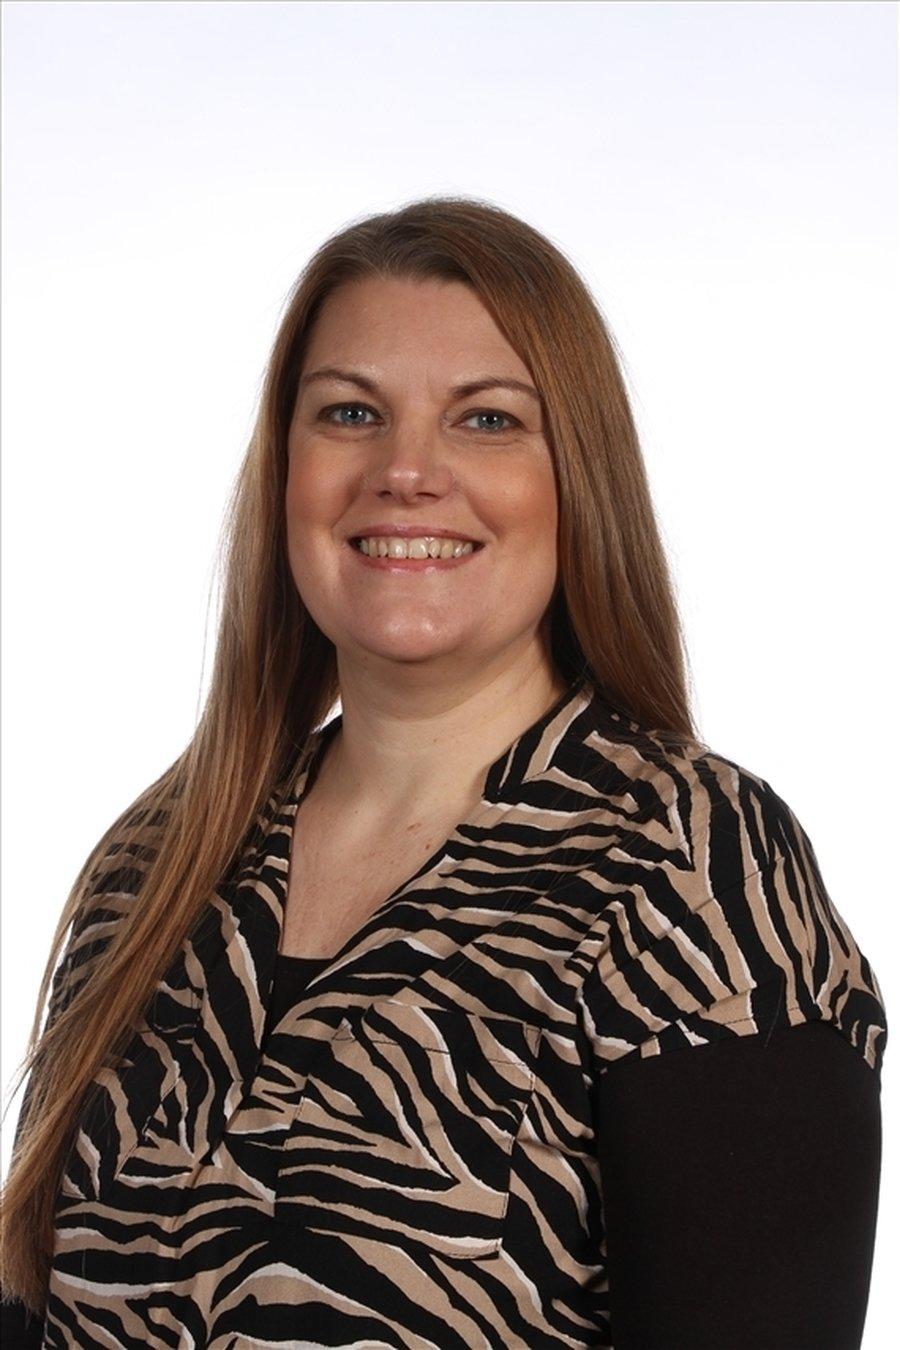 Mrs Clark, School Business Manger, Child Protection